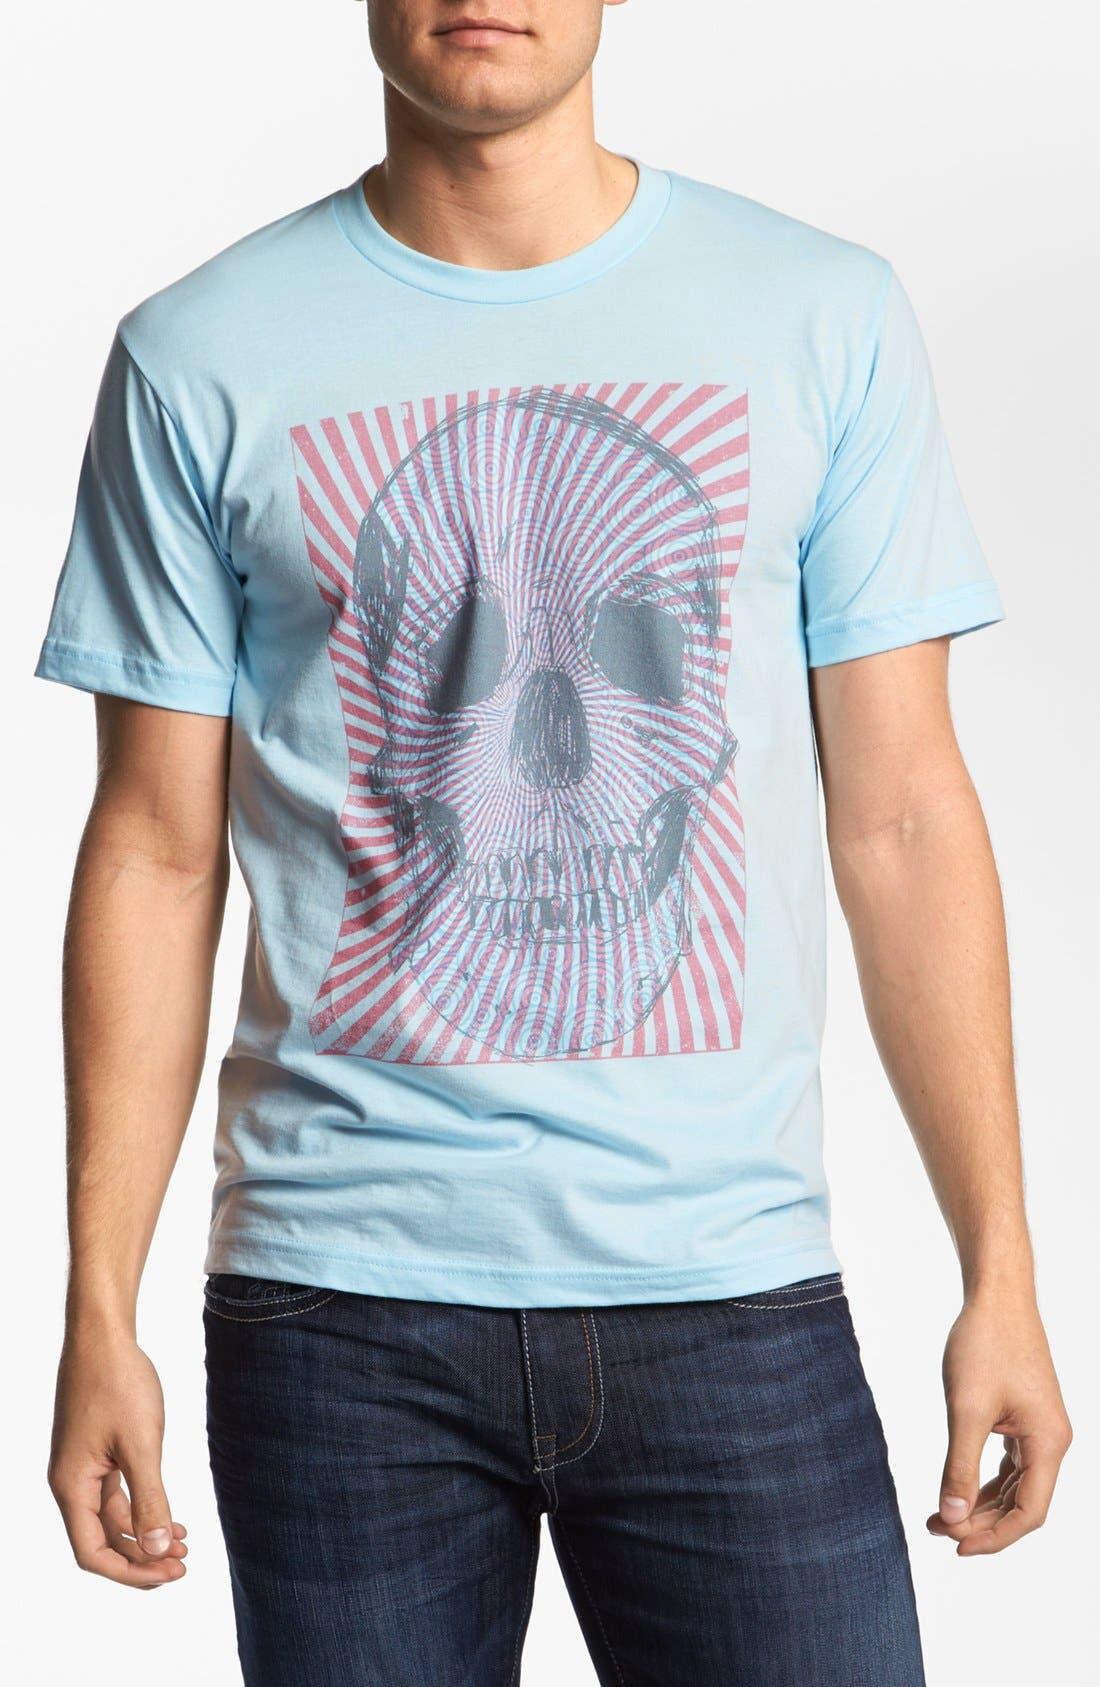 Main Image - The Poster List 'Swirl Skull' T-Shirt